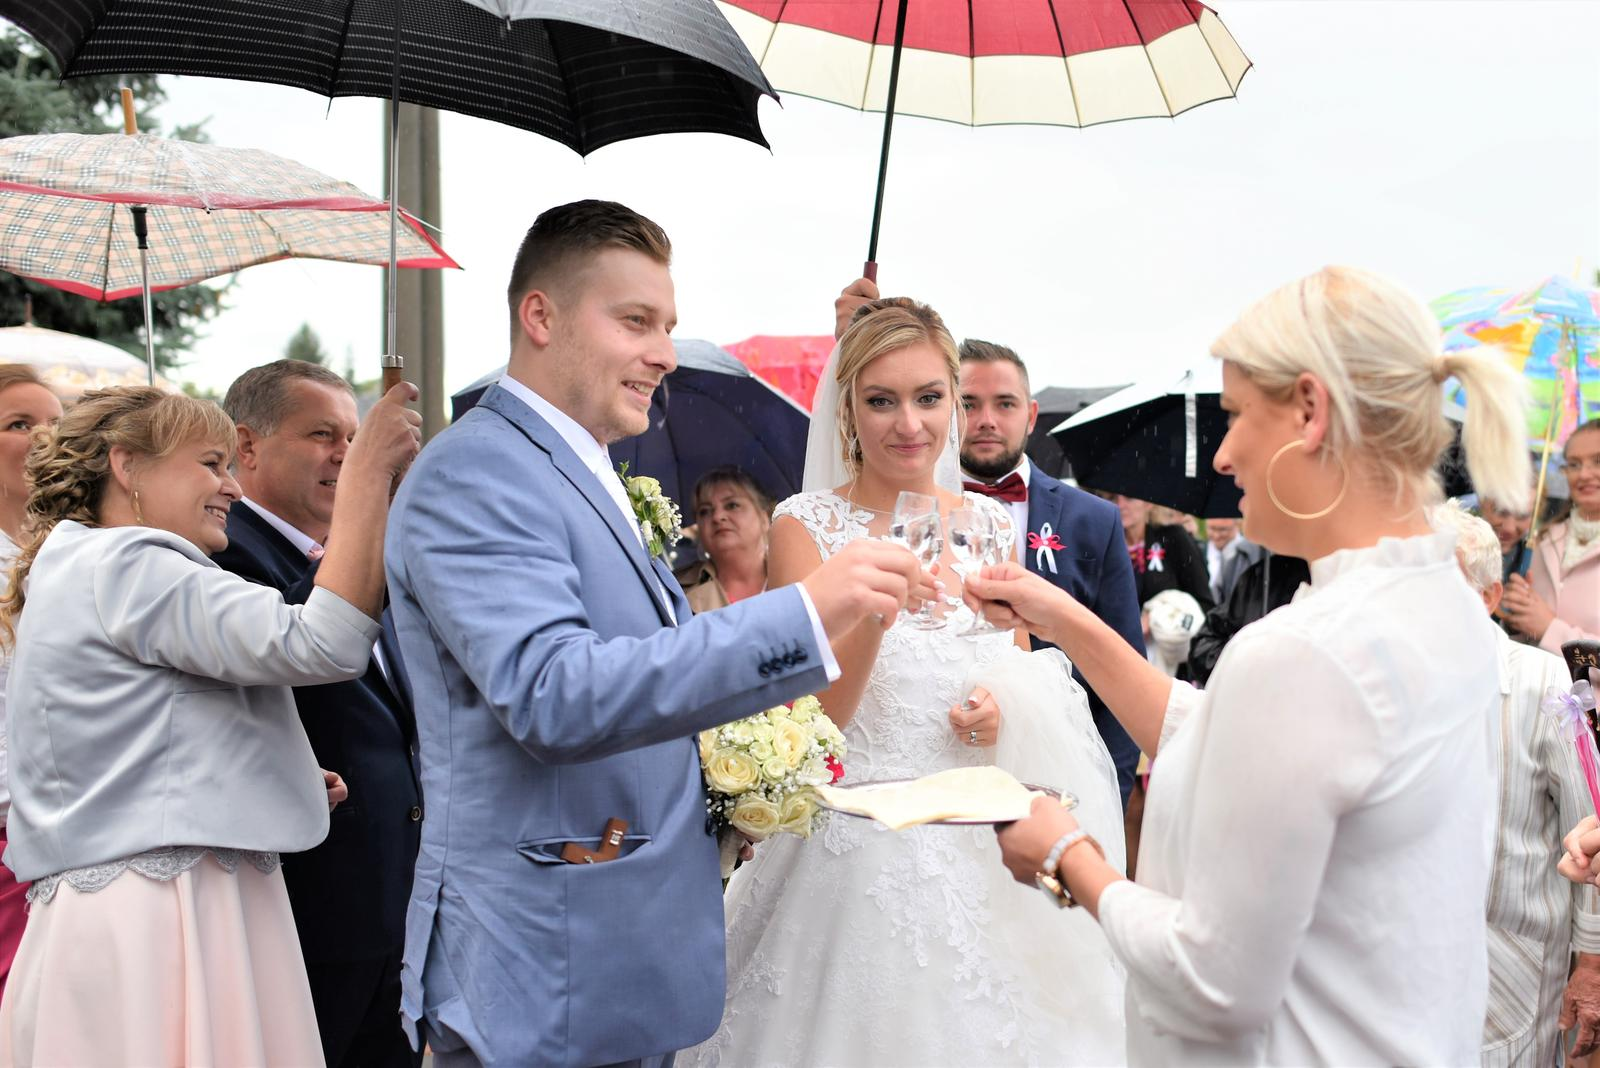 DJ + Fotografka na Vašu svadbu, KD u Palušáka - Pata - Obrázok č. 1